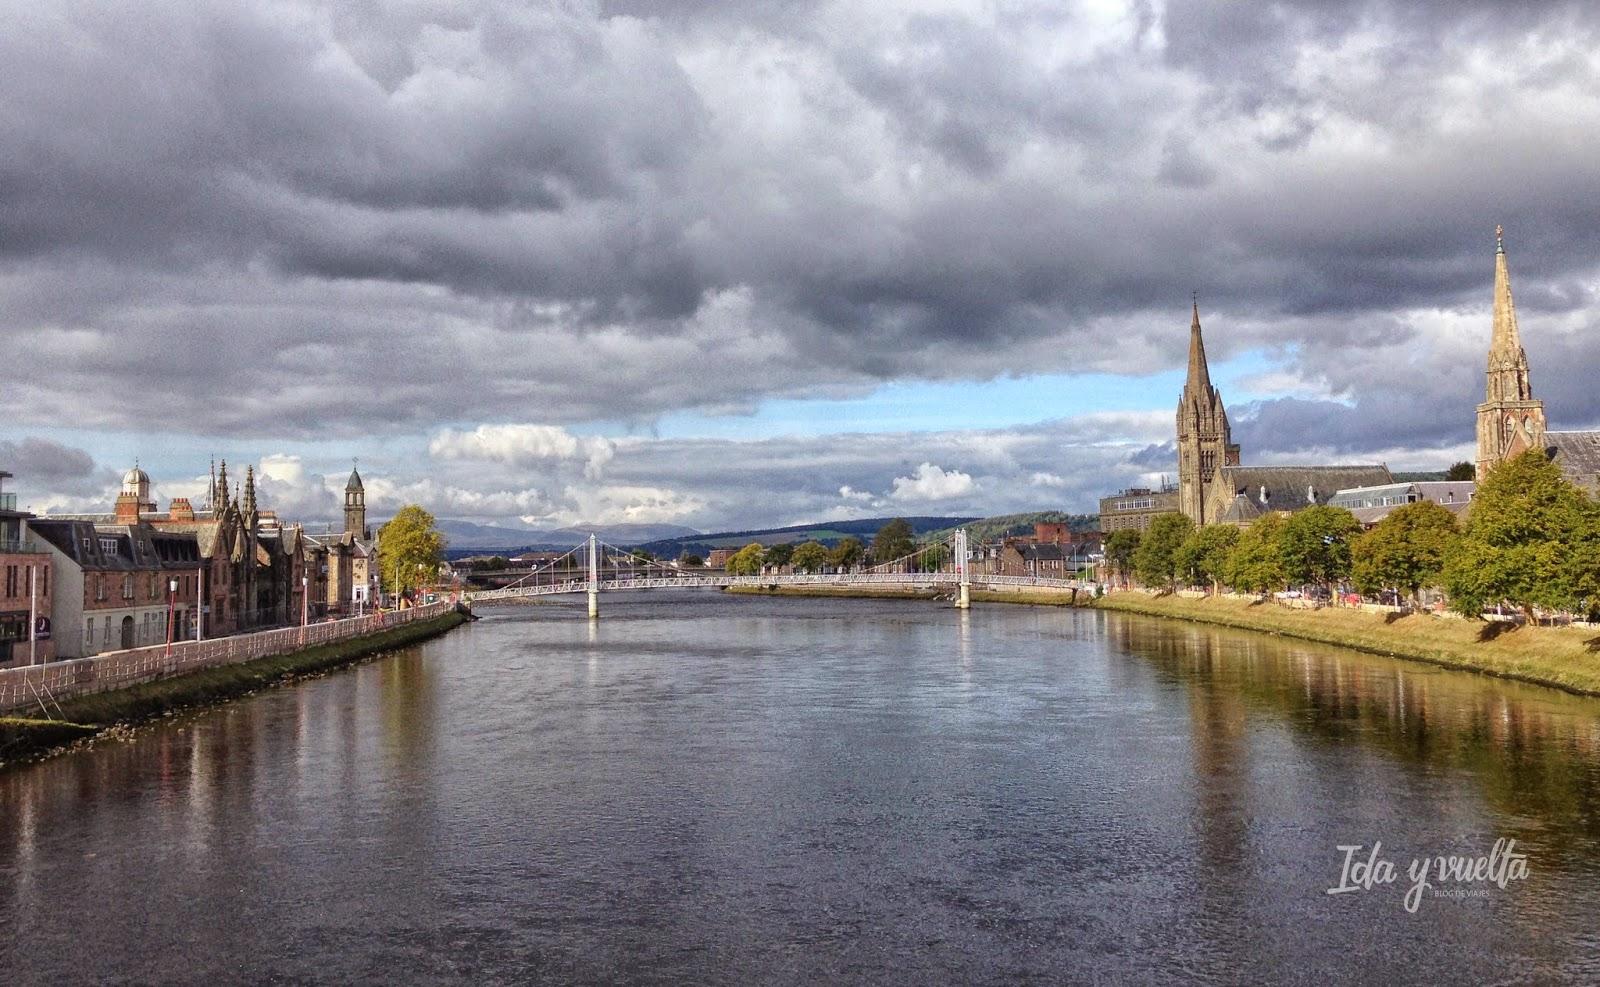 Vista de Inverness en Escocia